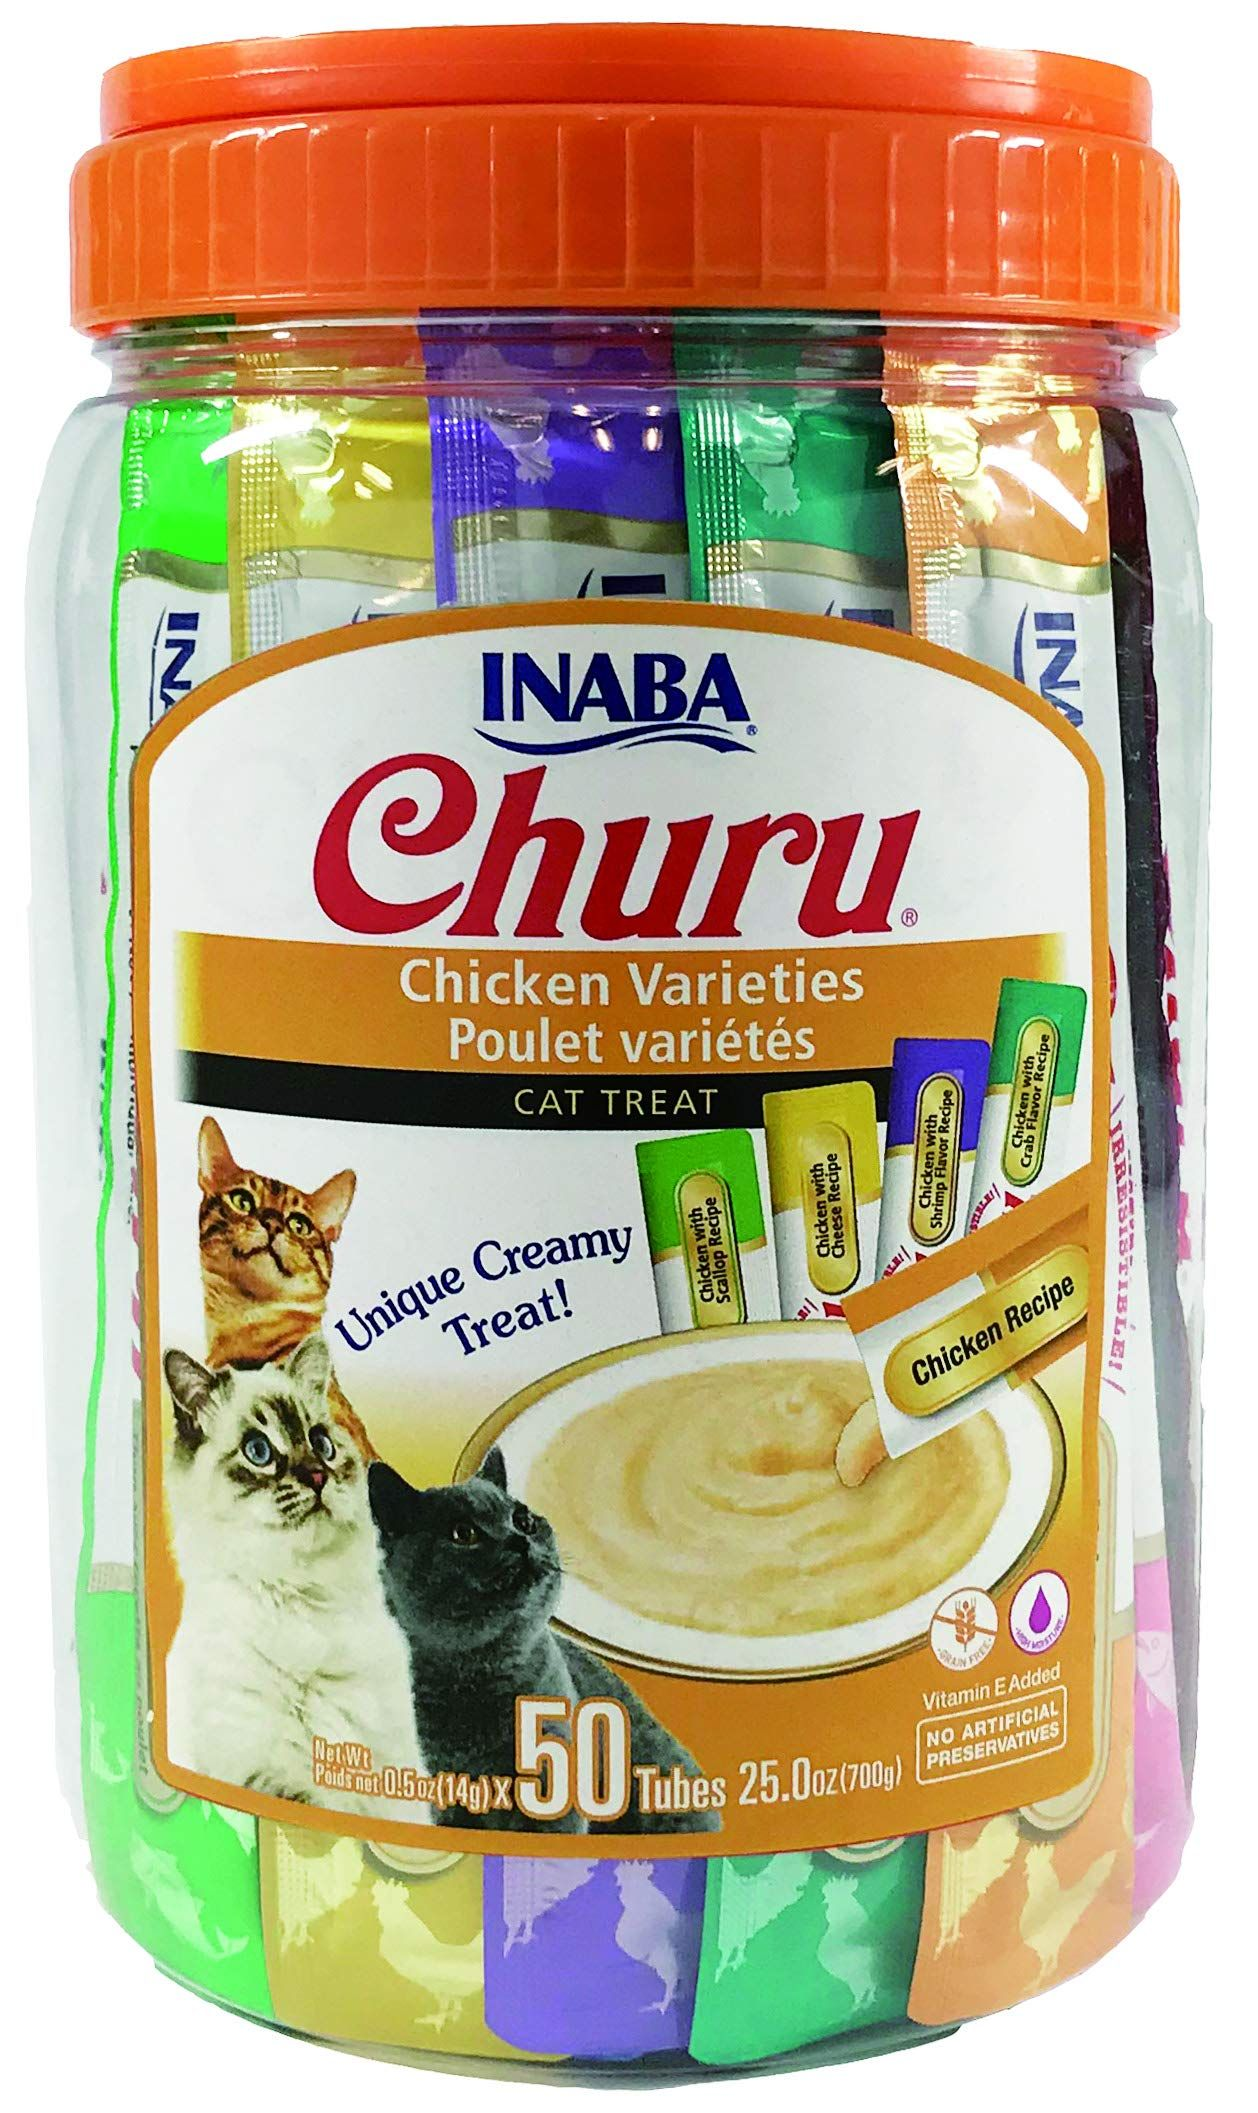 Inaba Churu Lickable Creamy Puree Cat Treats 5 Flavor Chicken Variety Canister Of 50 Tubes Click On Th In 2020 Cat Treats Natural Cat Treats Freeze Dried Dog Treats